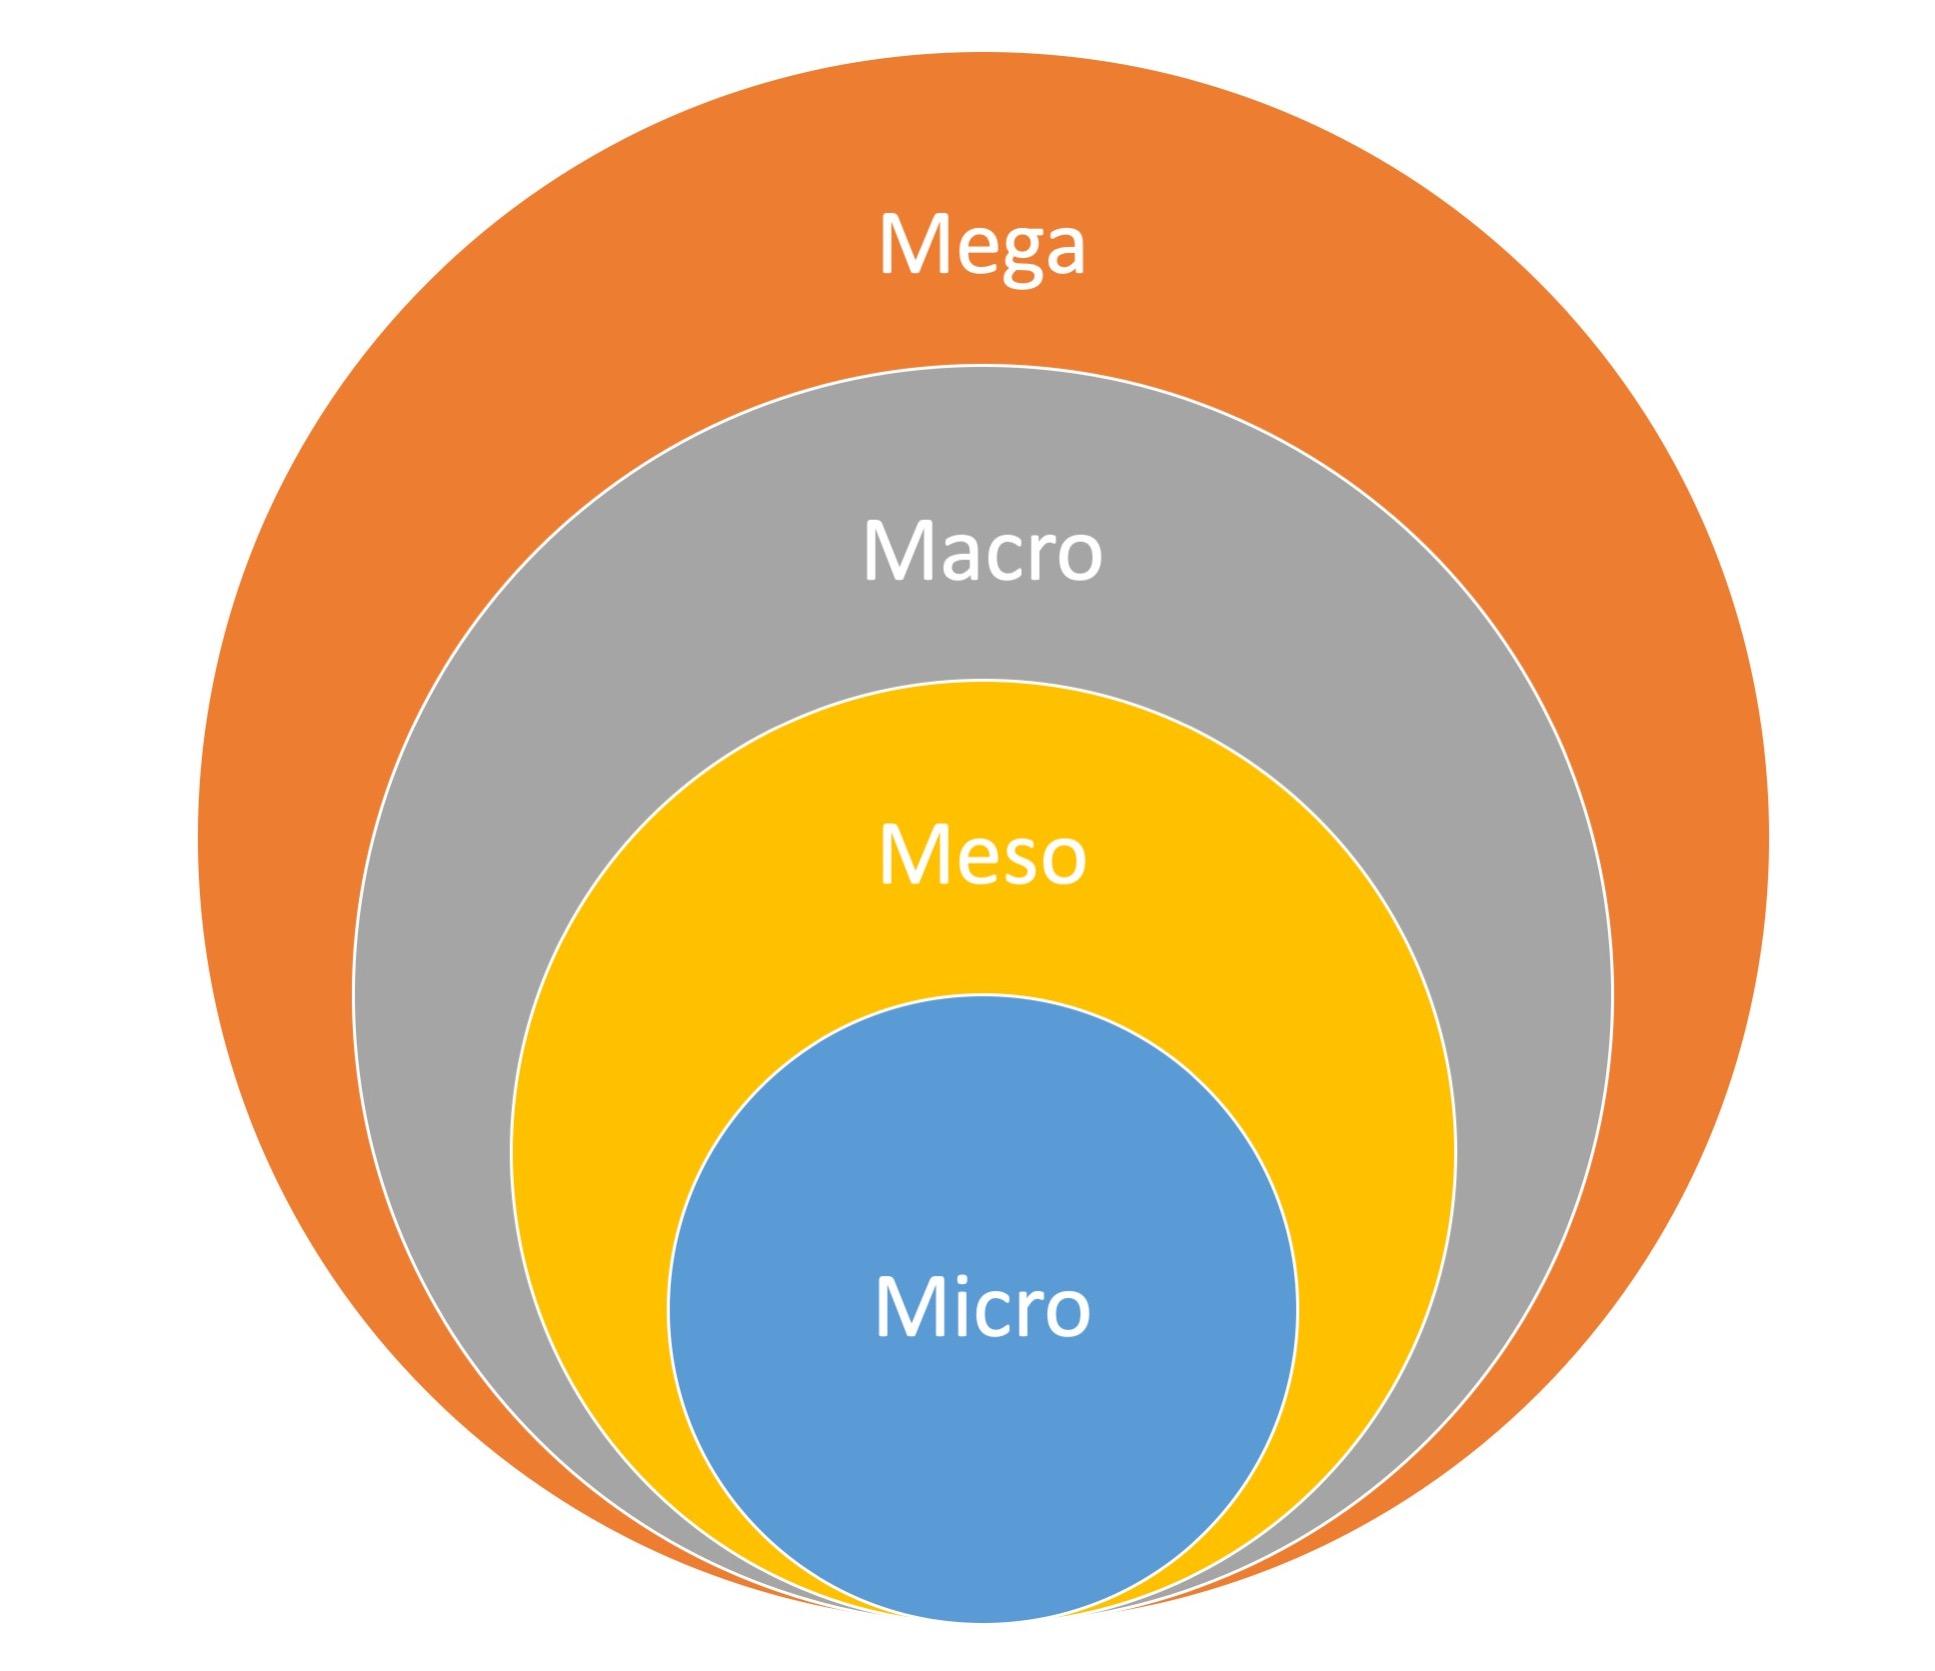 The 4M Framework: Micro, Meso, Macro, and Mega Levels